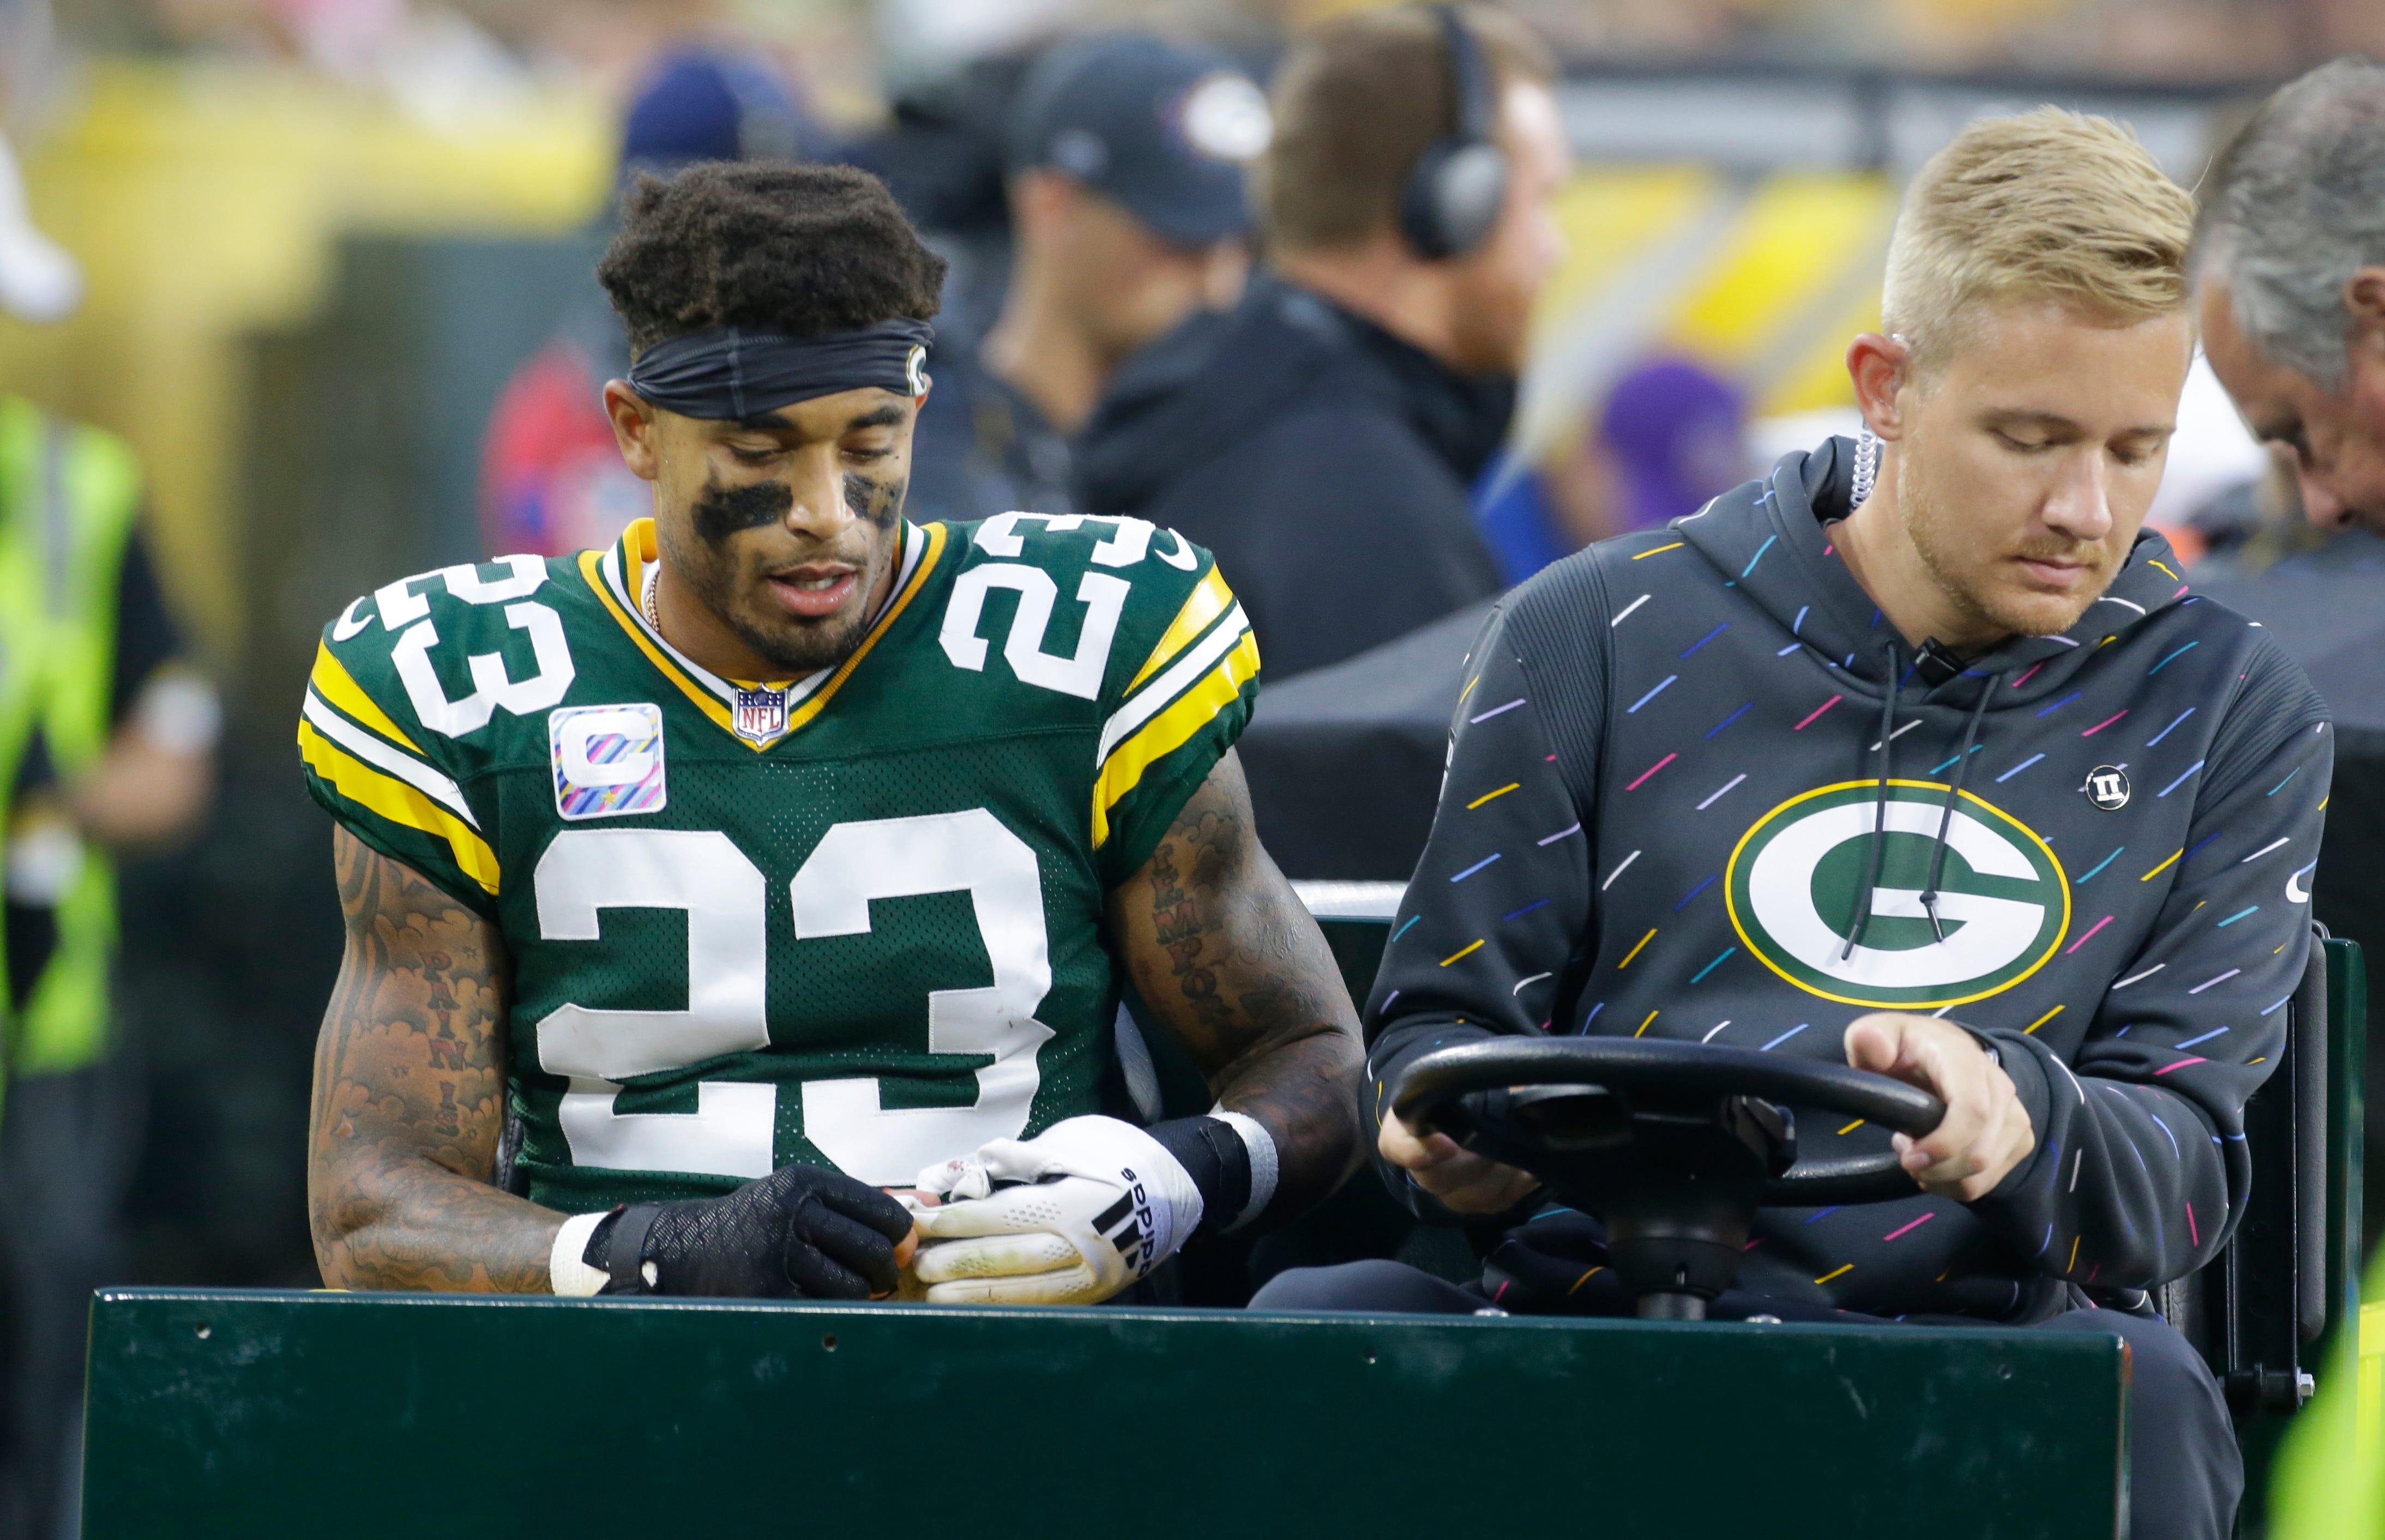 Packers Finding Ways to Win Despite Rash of Key Injuries